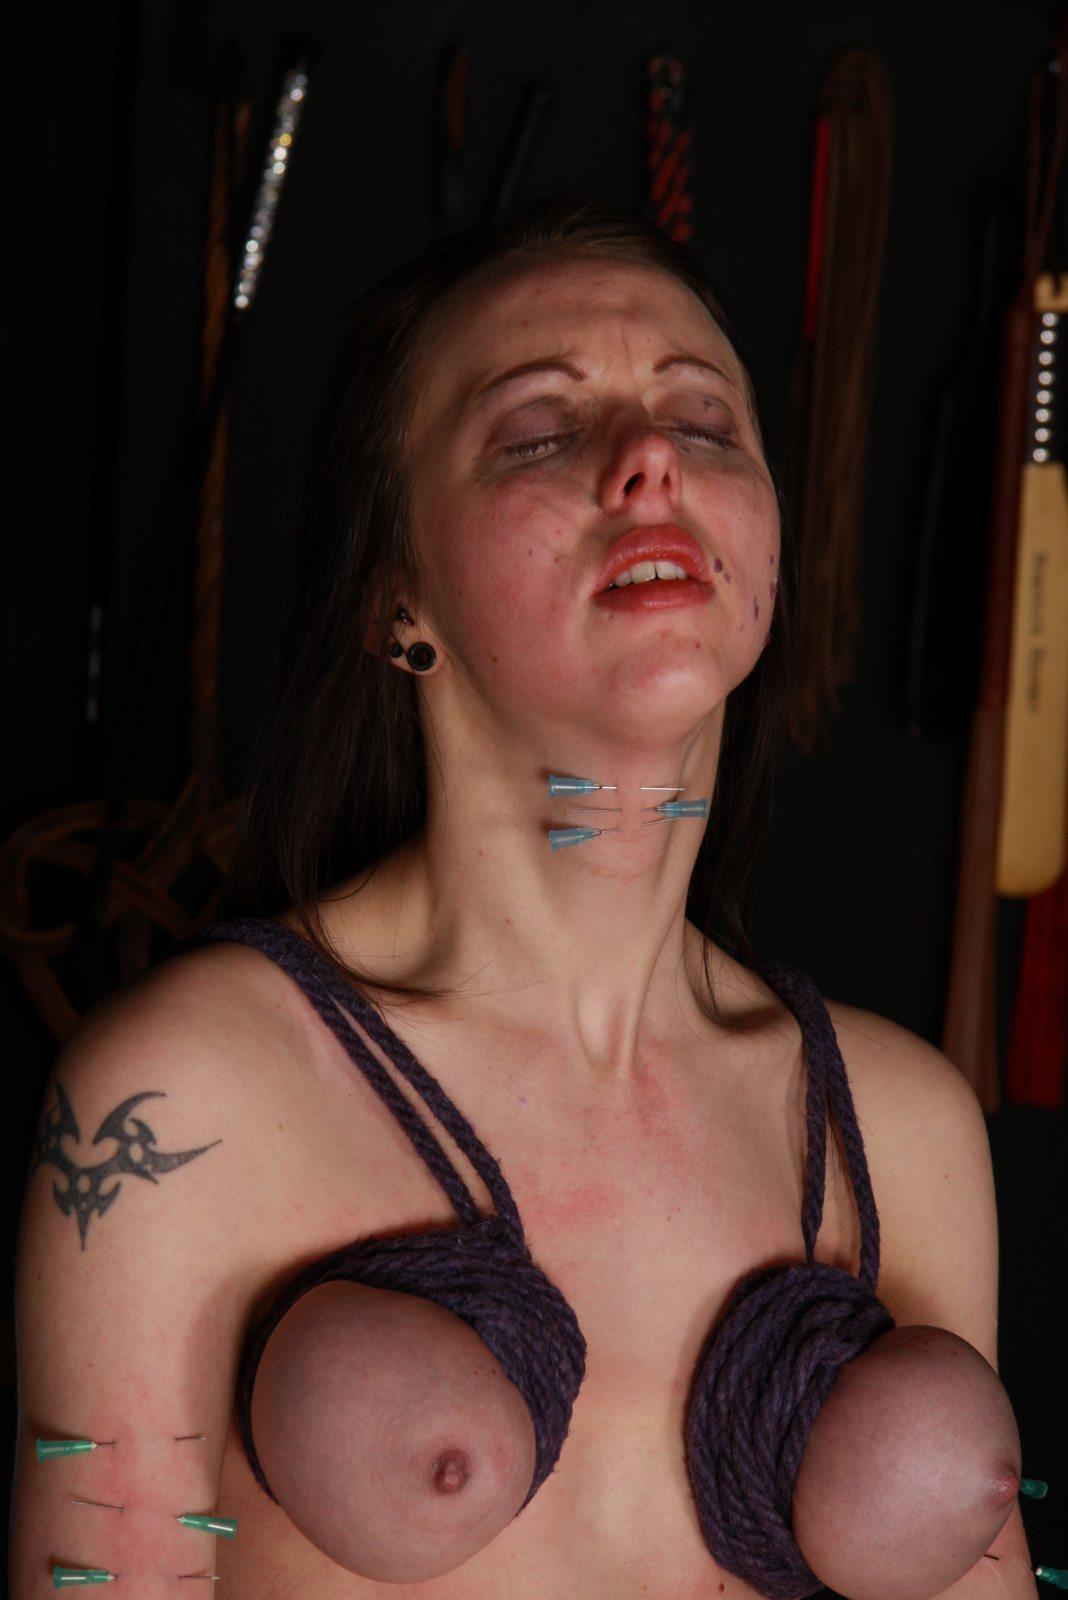 Slaves needle pain bdsm torture play